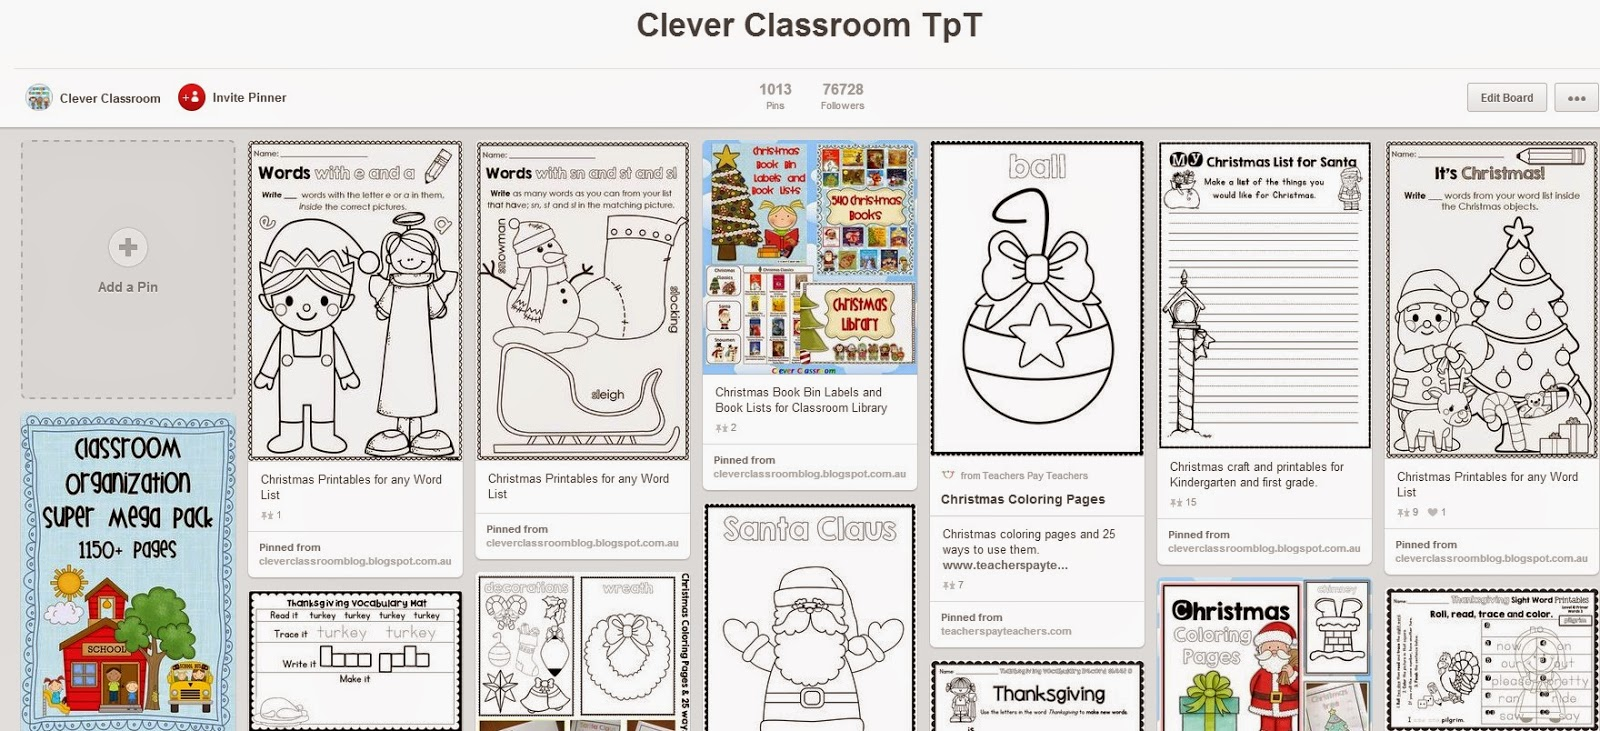 Clever Classroom Pinterest board